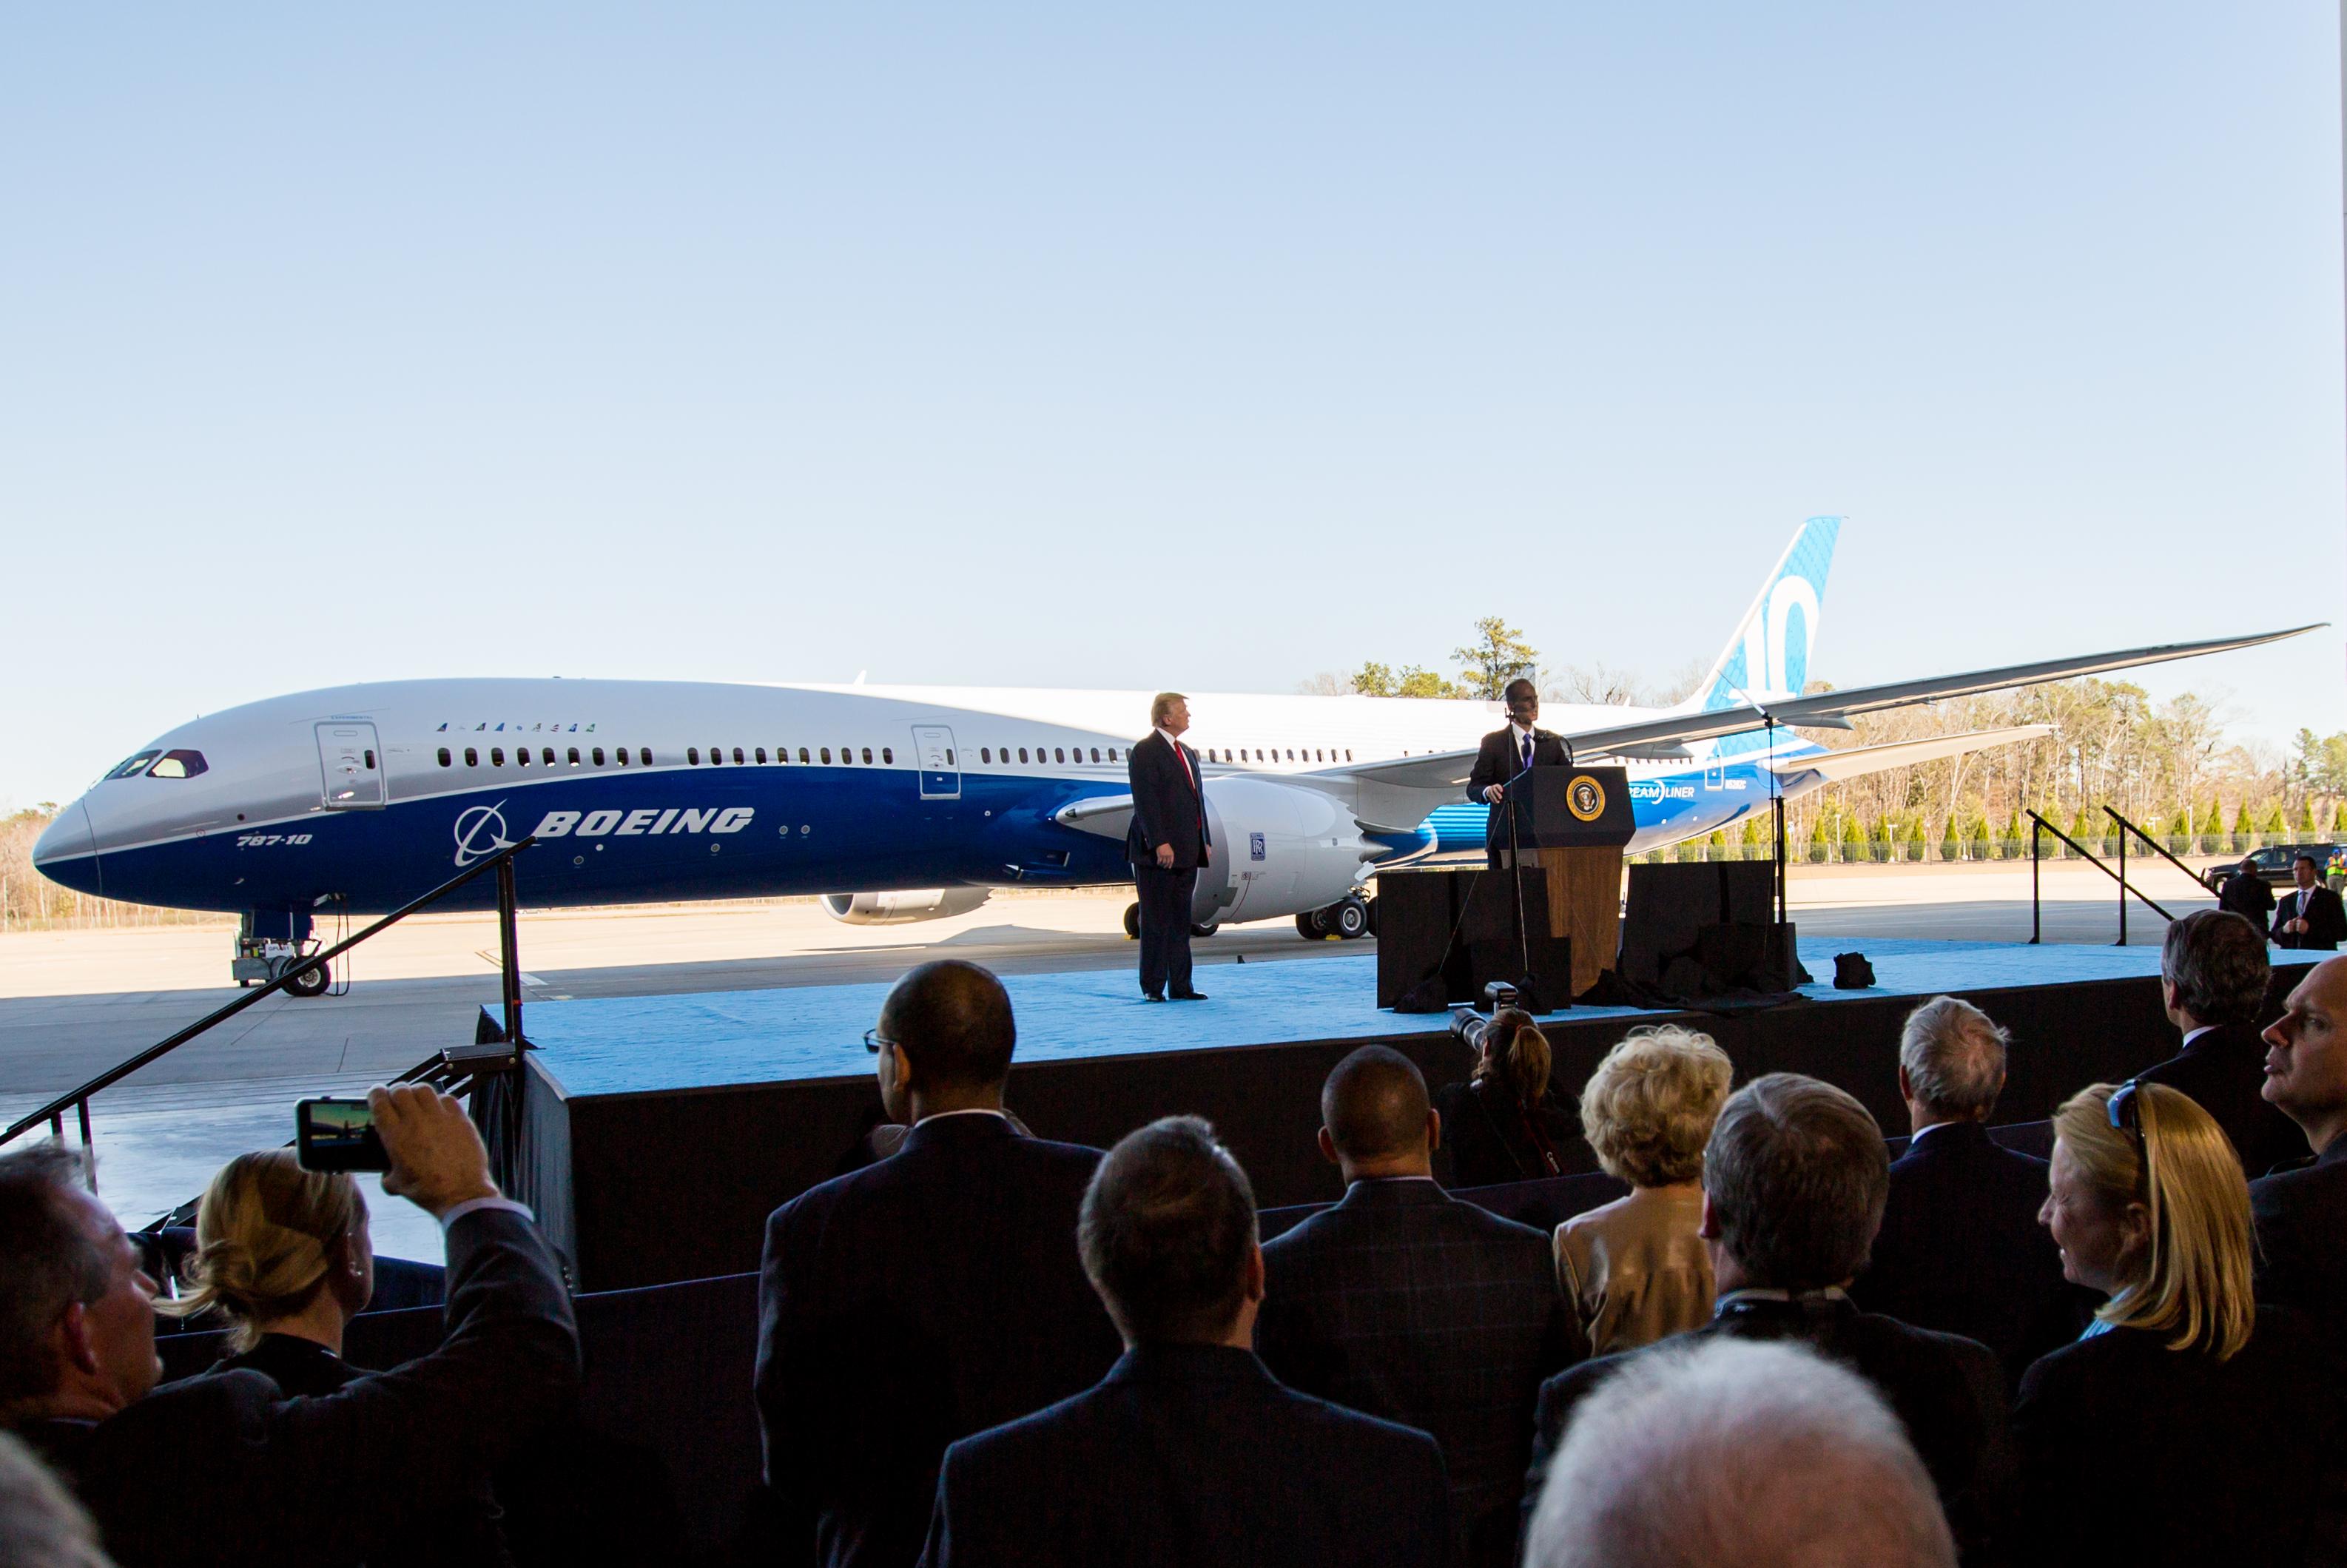 Boeing 787 Dreamliner - Wikipedia